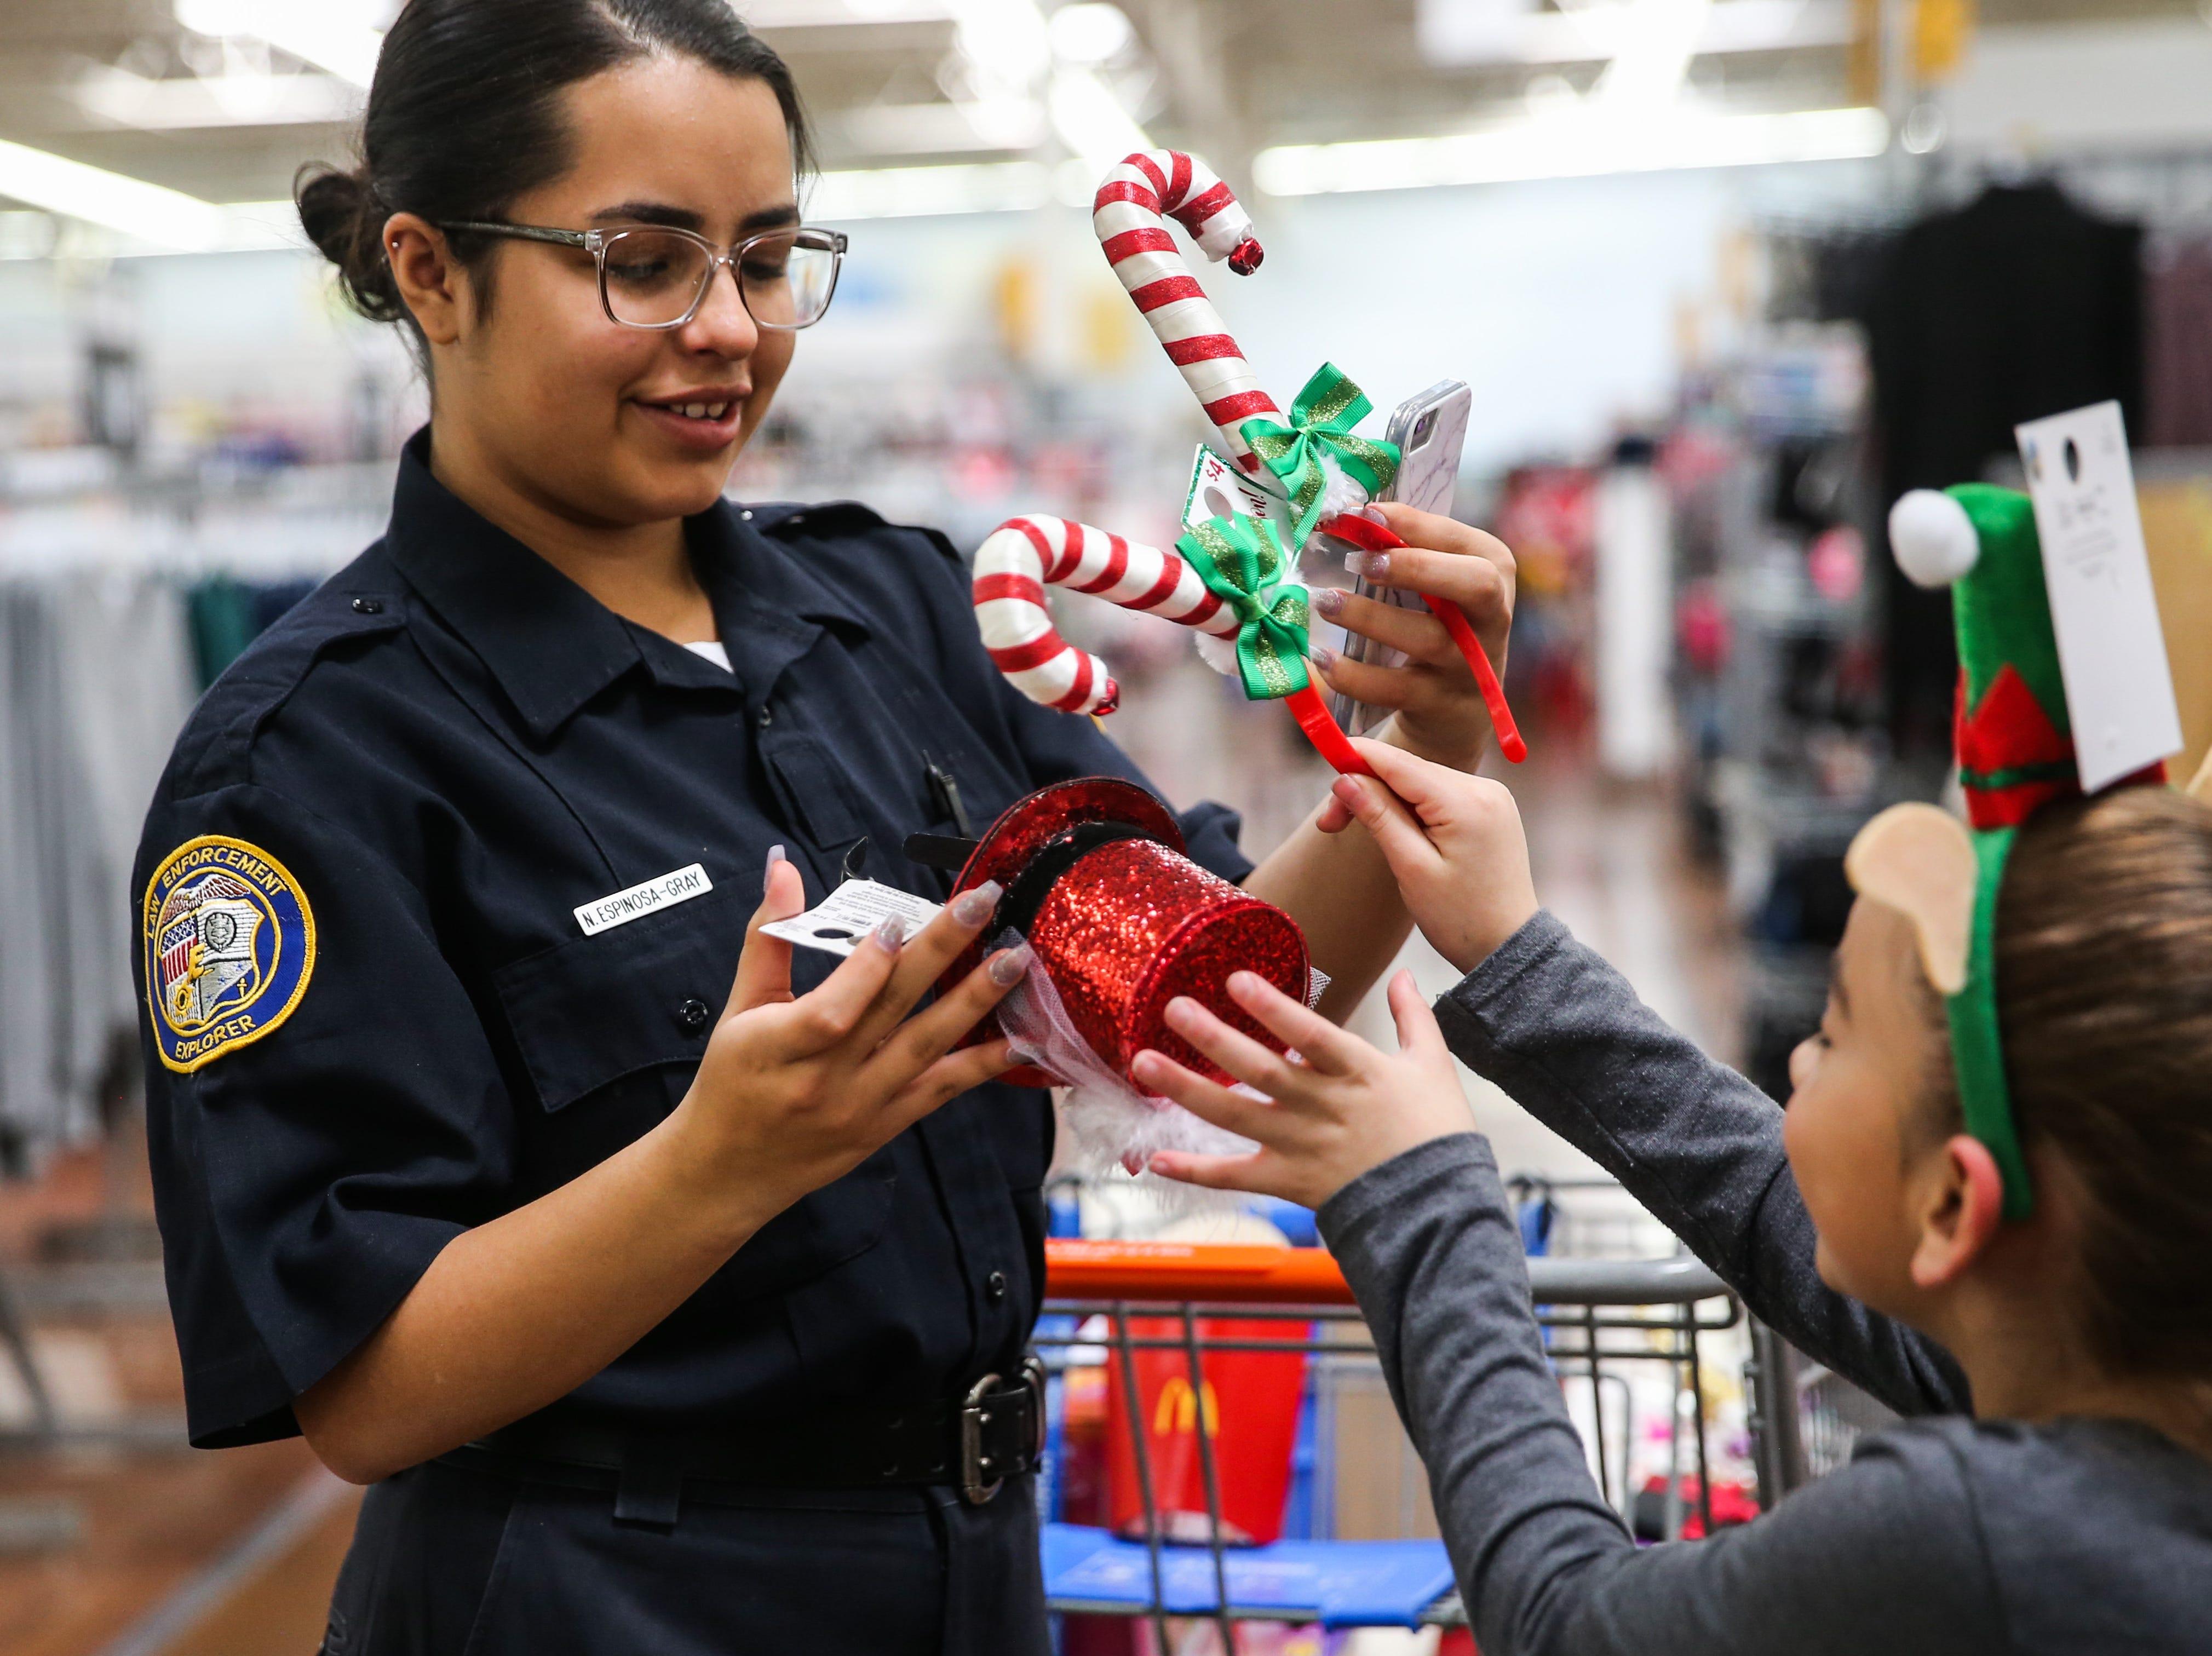 Nina Espinosa-Gray, Law Enforcement Explorer, picks a headband with Jasmin Delacruz, 8, while Delacruz's father participants in Shop with a Cop event Saturday, Dec. 15, 2018, at Walmart.